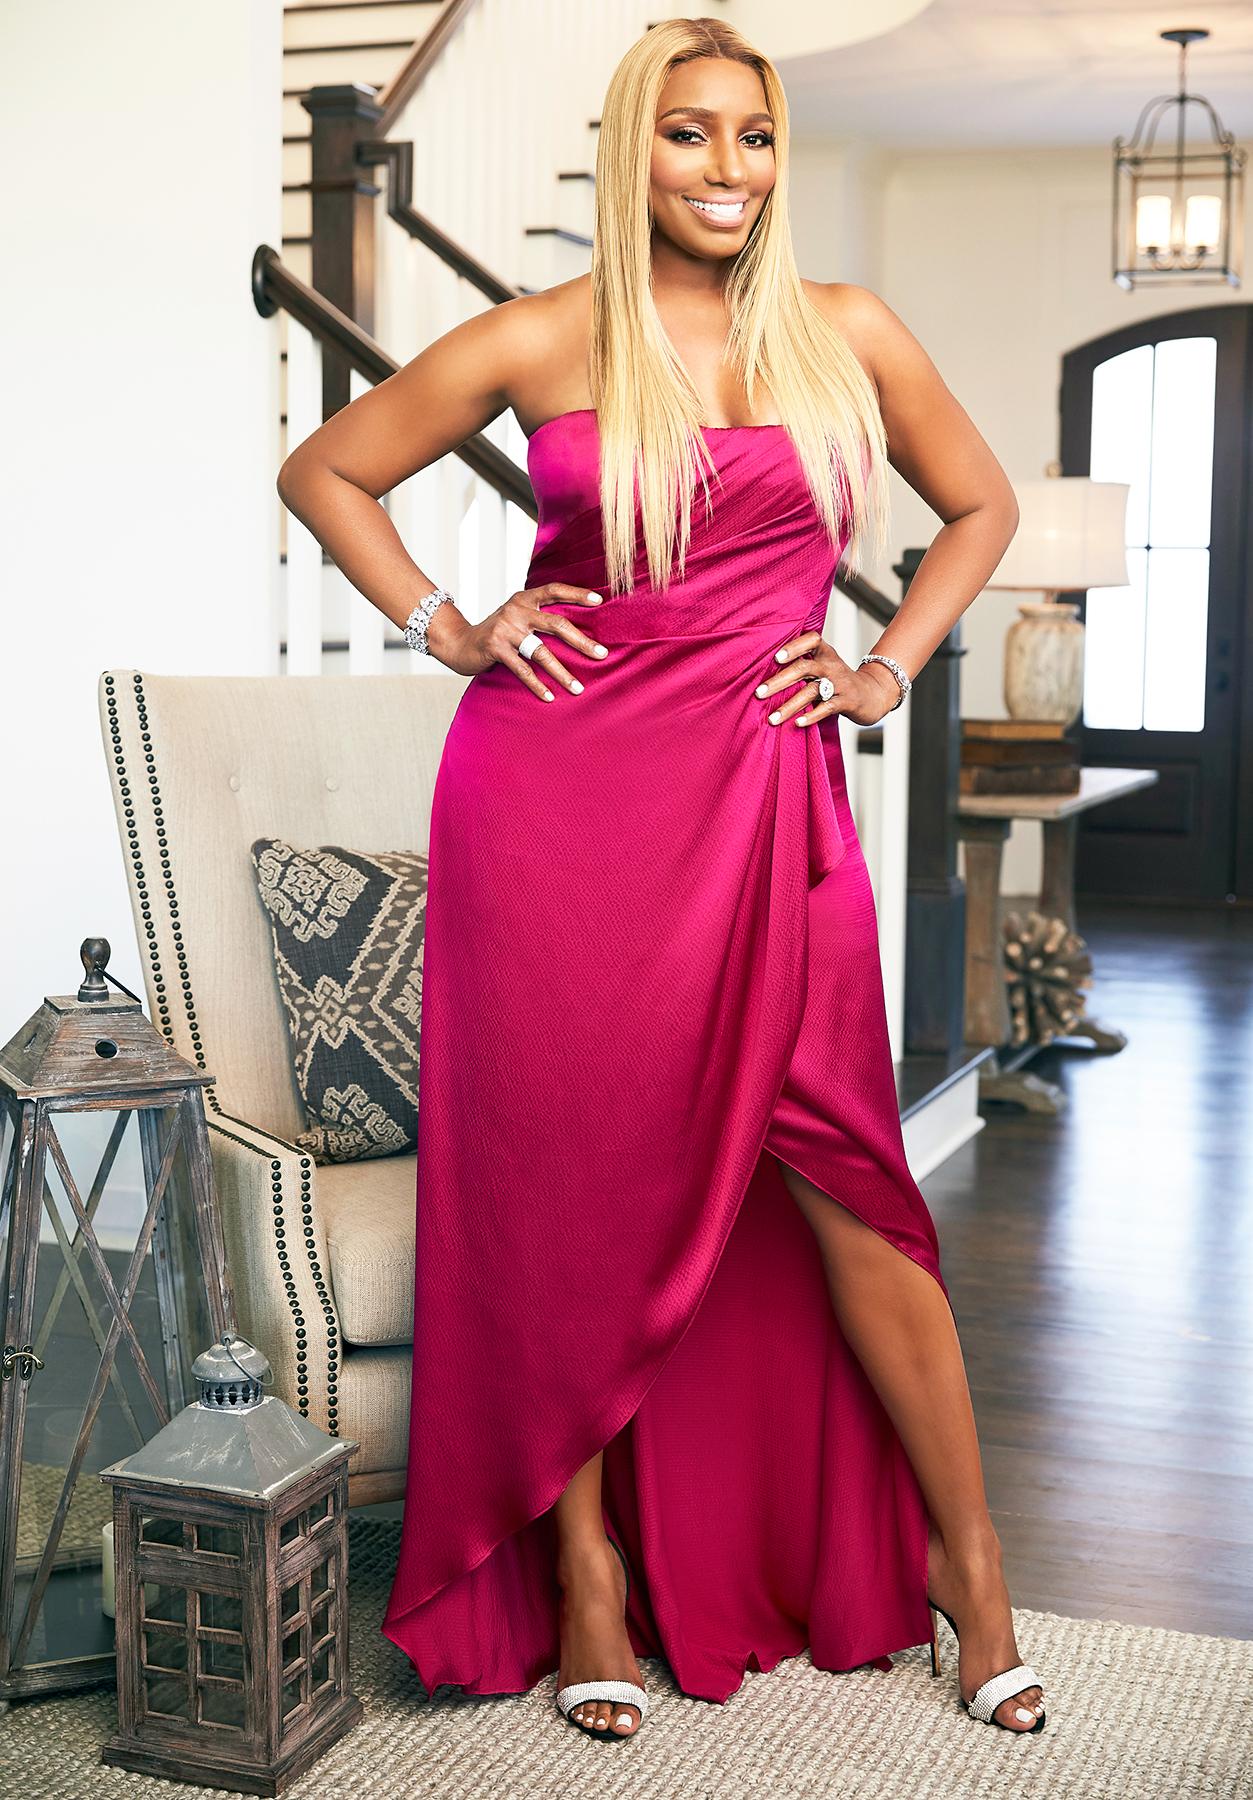 Nene Leakes The Real Housewives of Atlanta